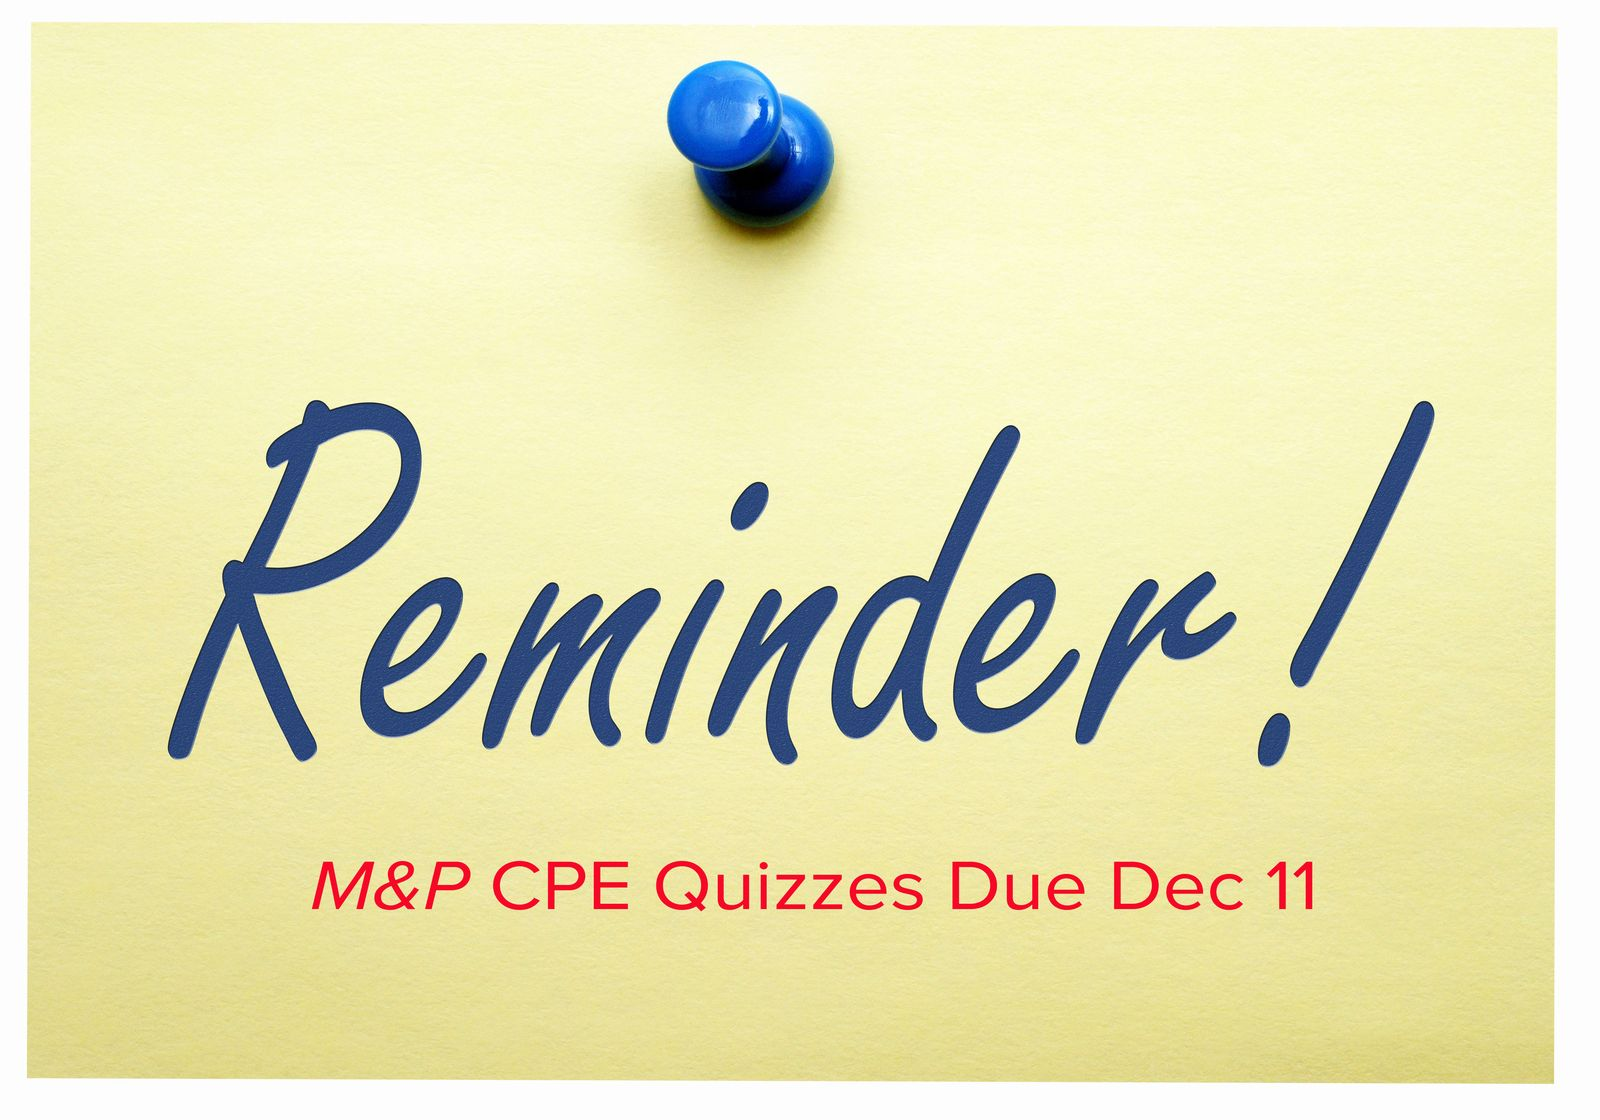 M&P CPE Deadline Reminder